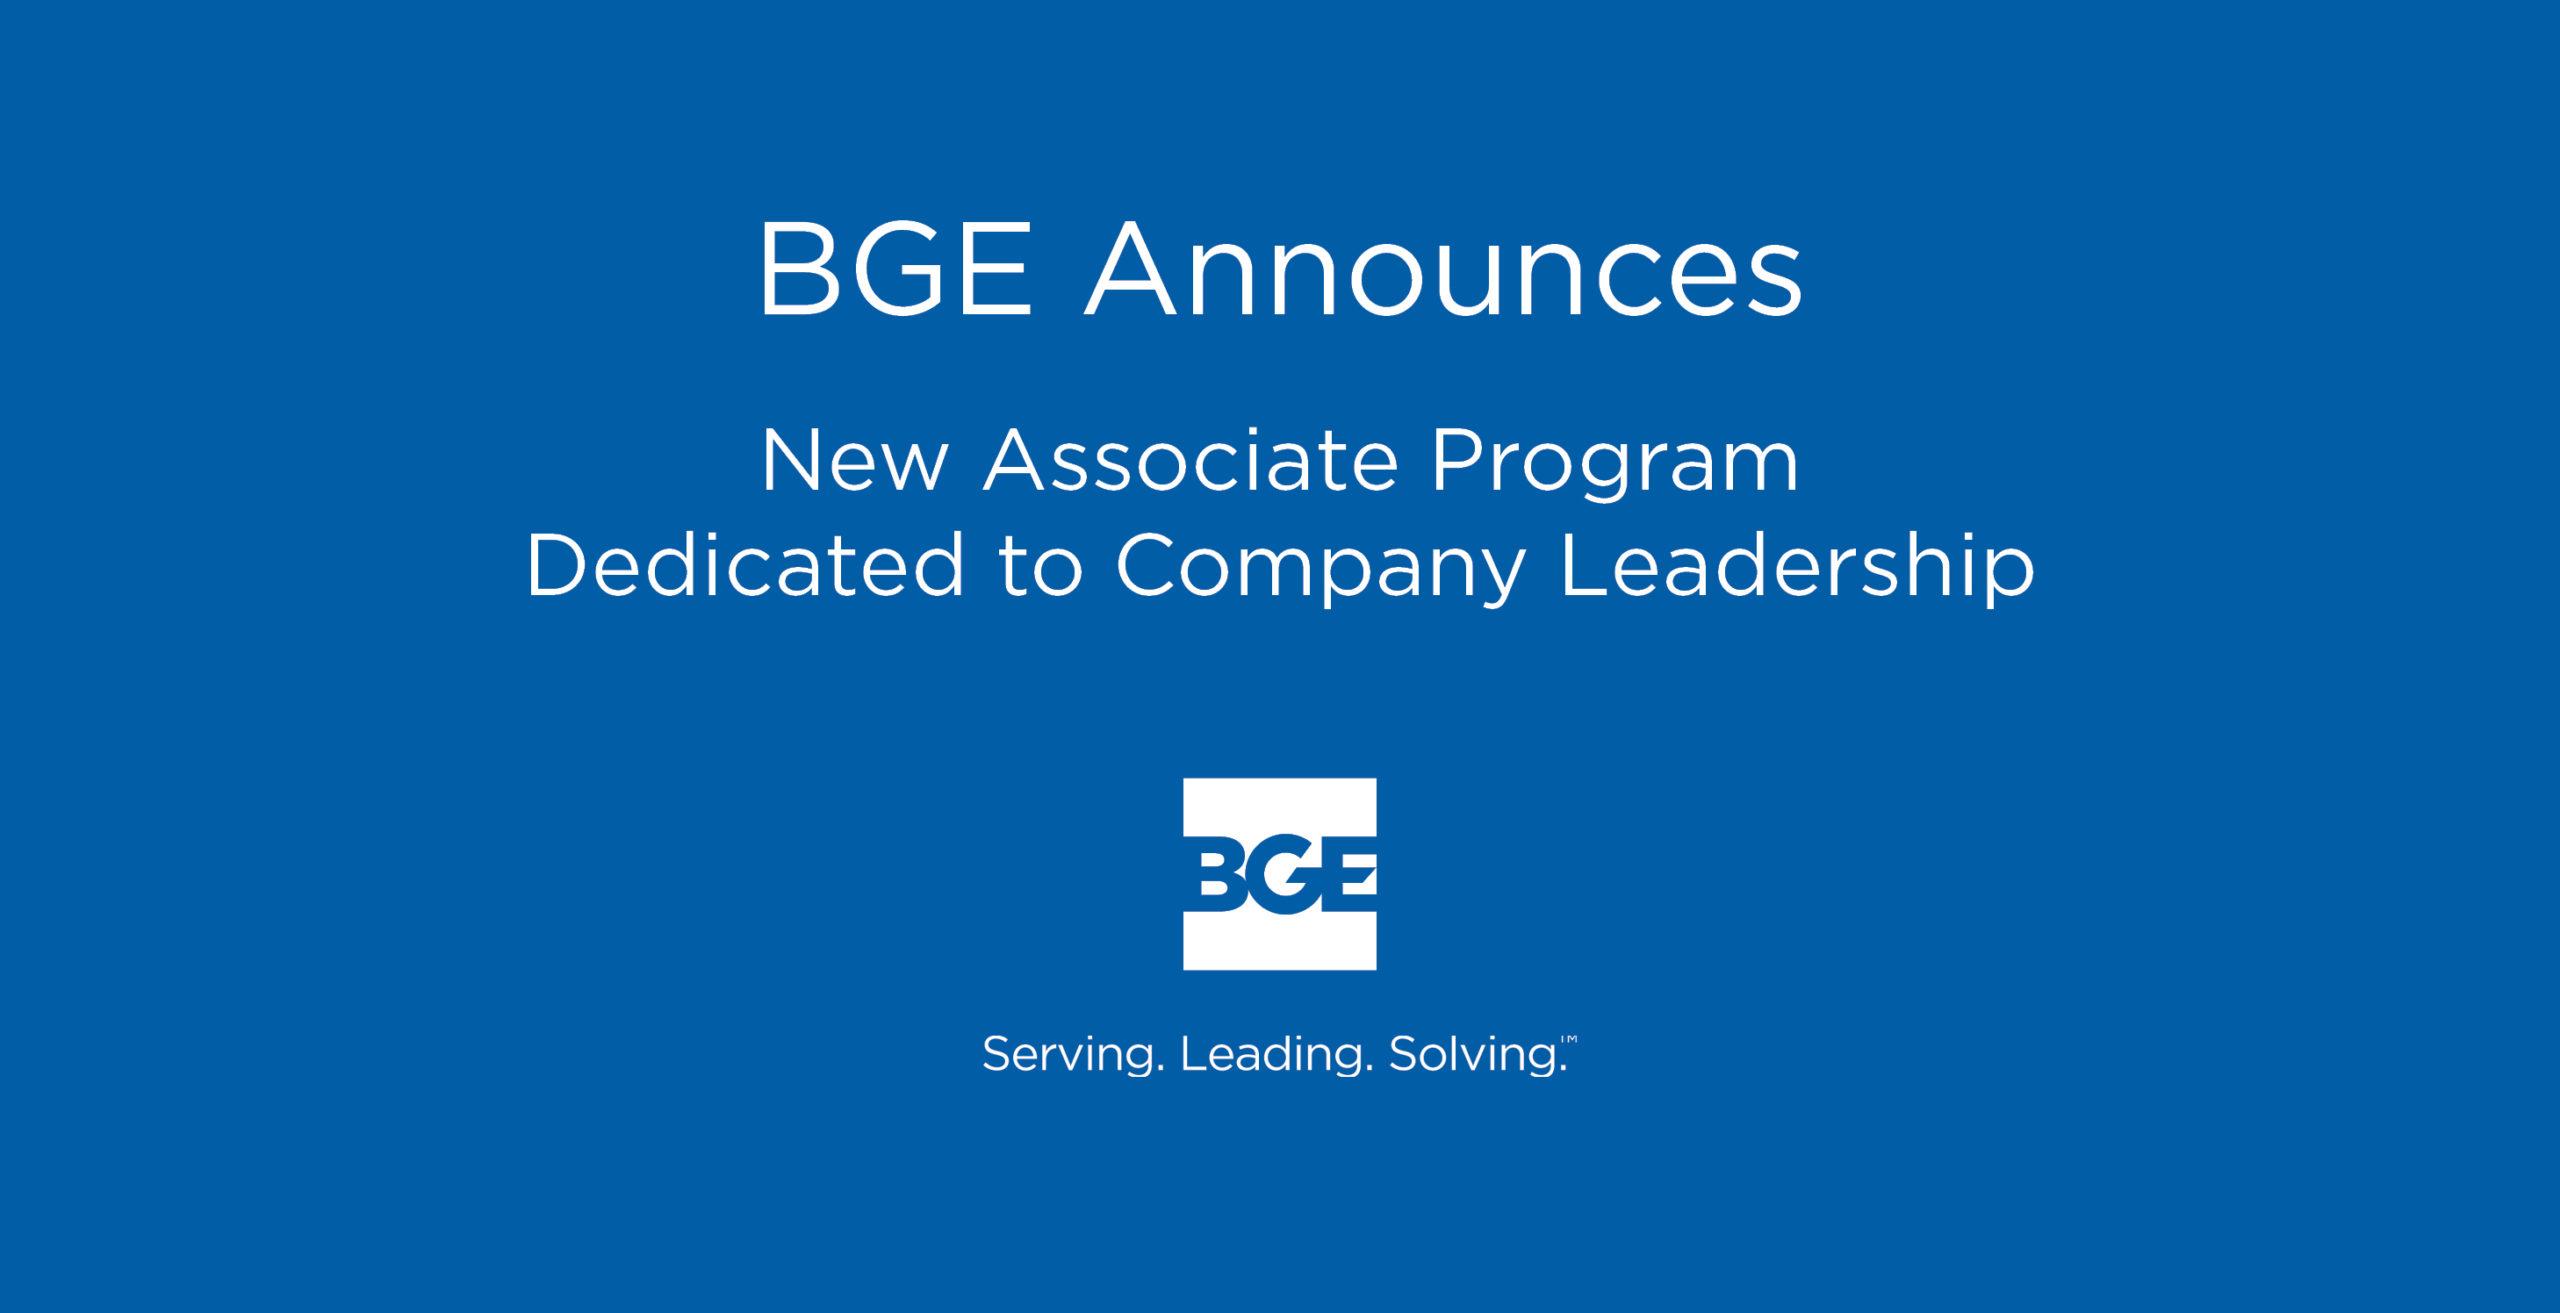 BGE Announces New Associate Program Dedicated to Company Leadership